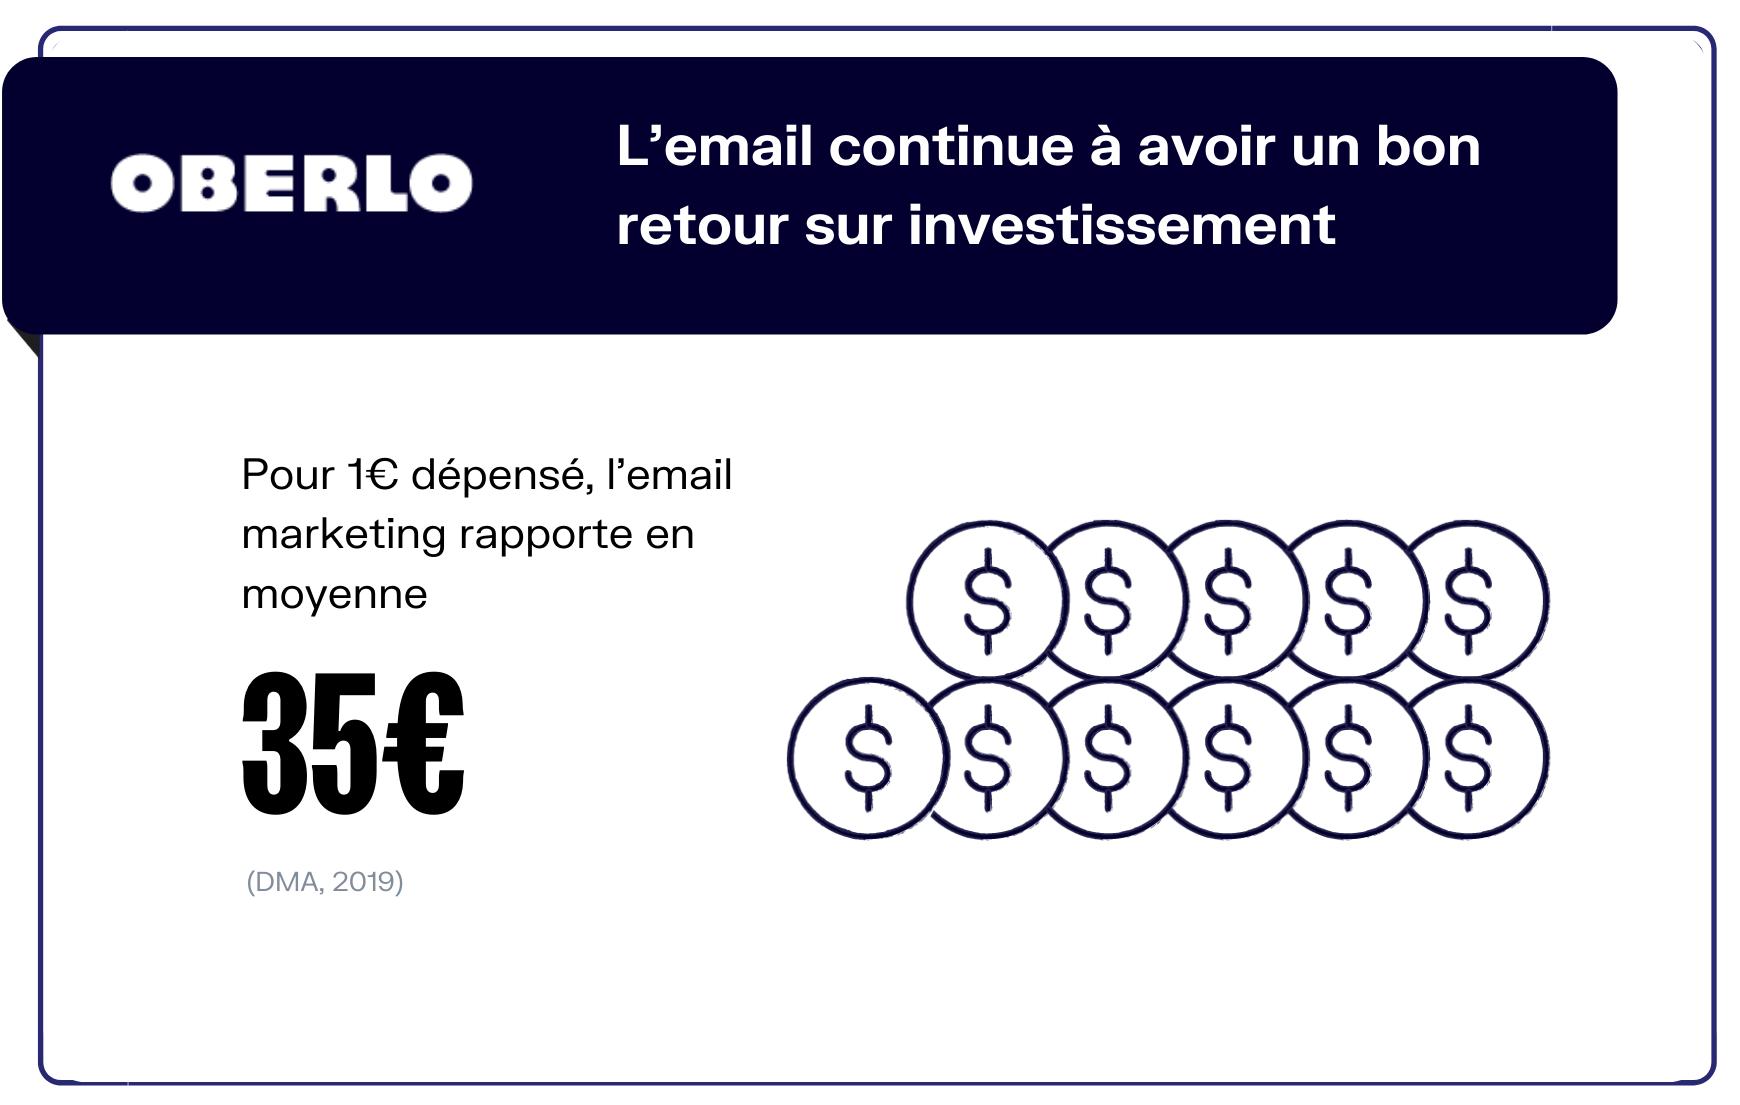 retour sur investissement email marketing